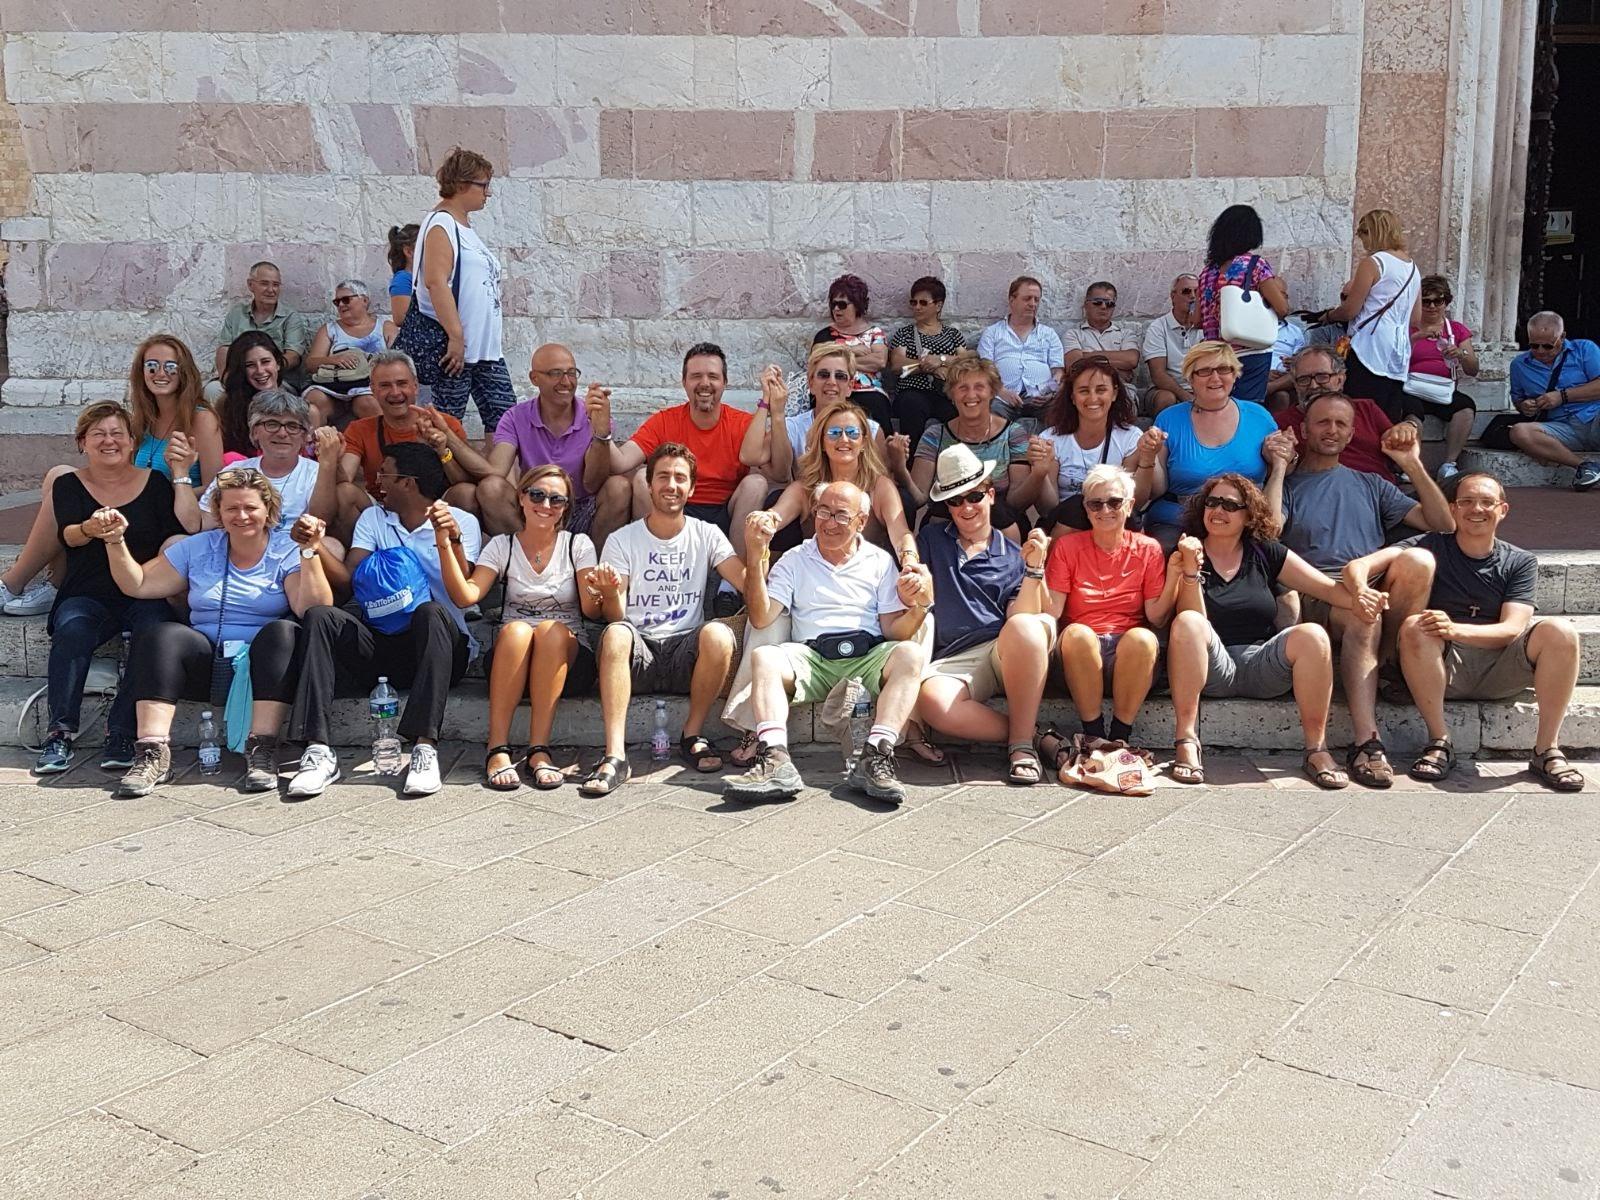 foto di gruppo ad Assisi